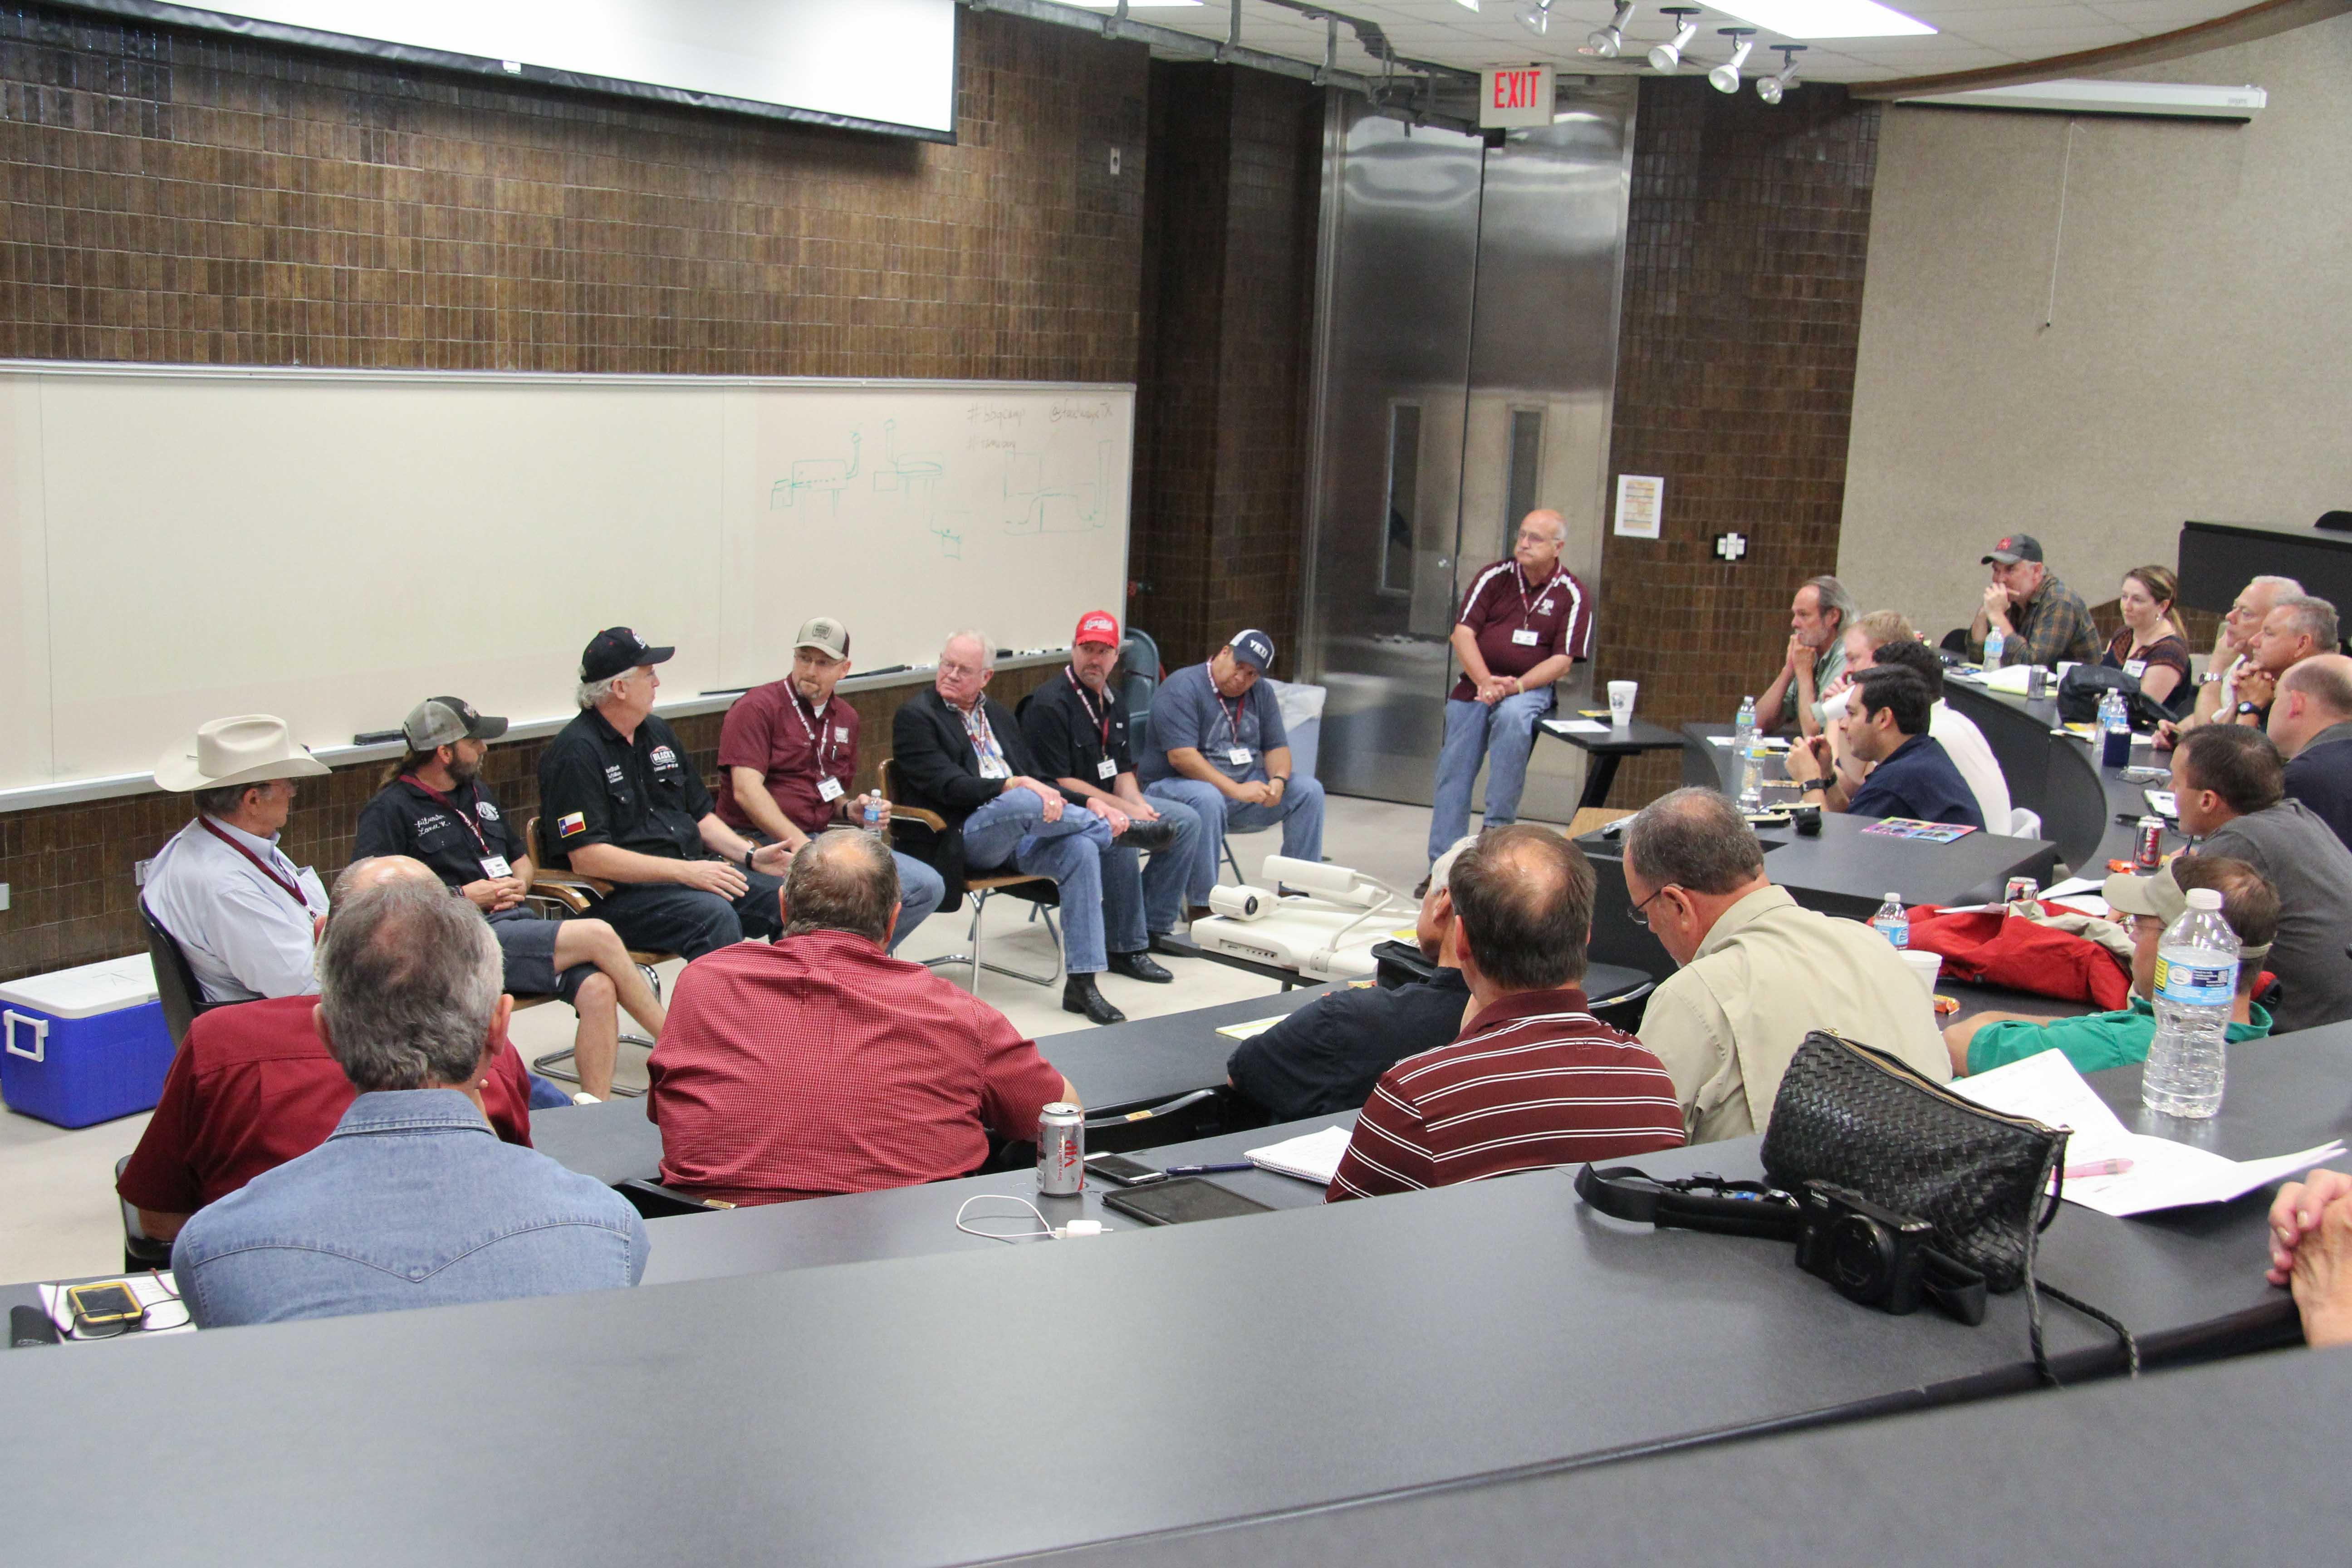 L-R: Tom Perini, Lance Kirkpatrick, Kent Black, Bryan Bracewell, Nick Nickelson, Russell Roegels and Israel Campos talking wood & smoke